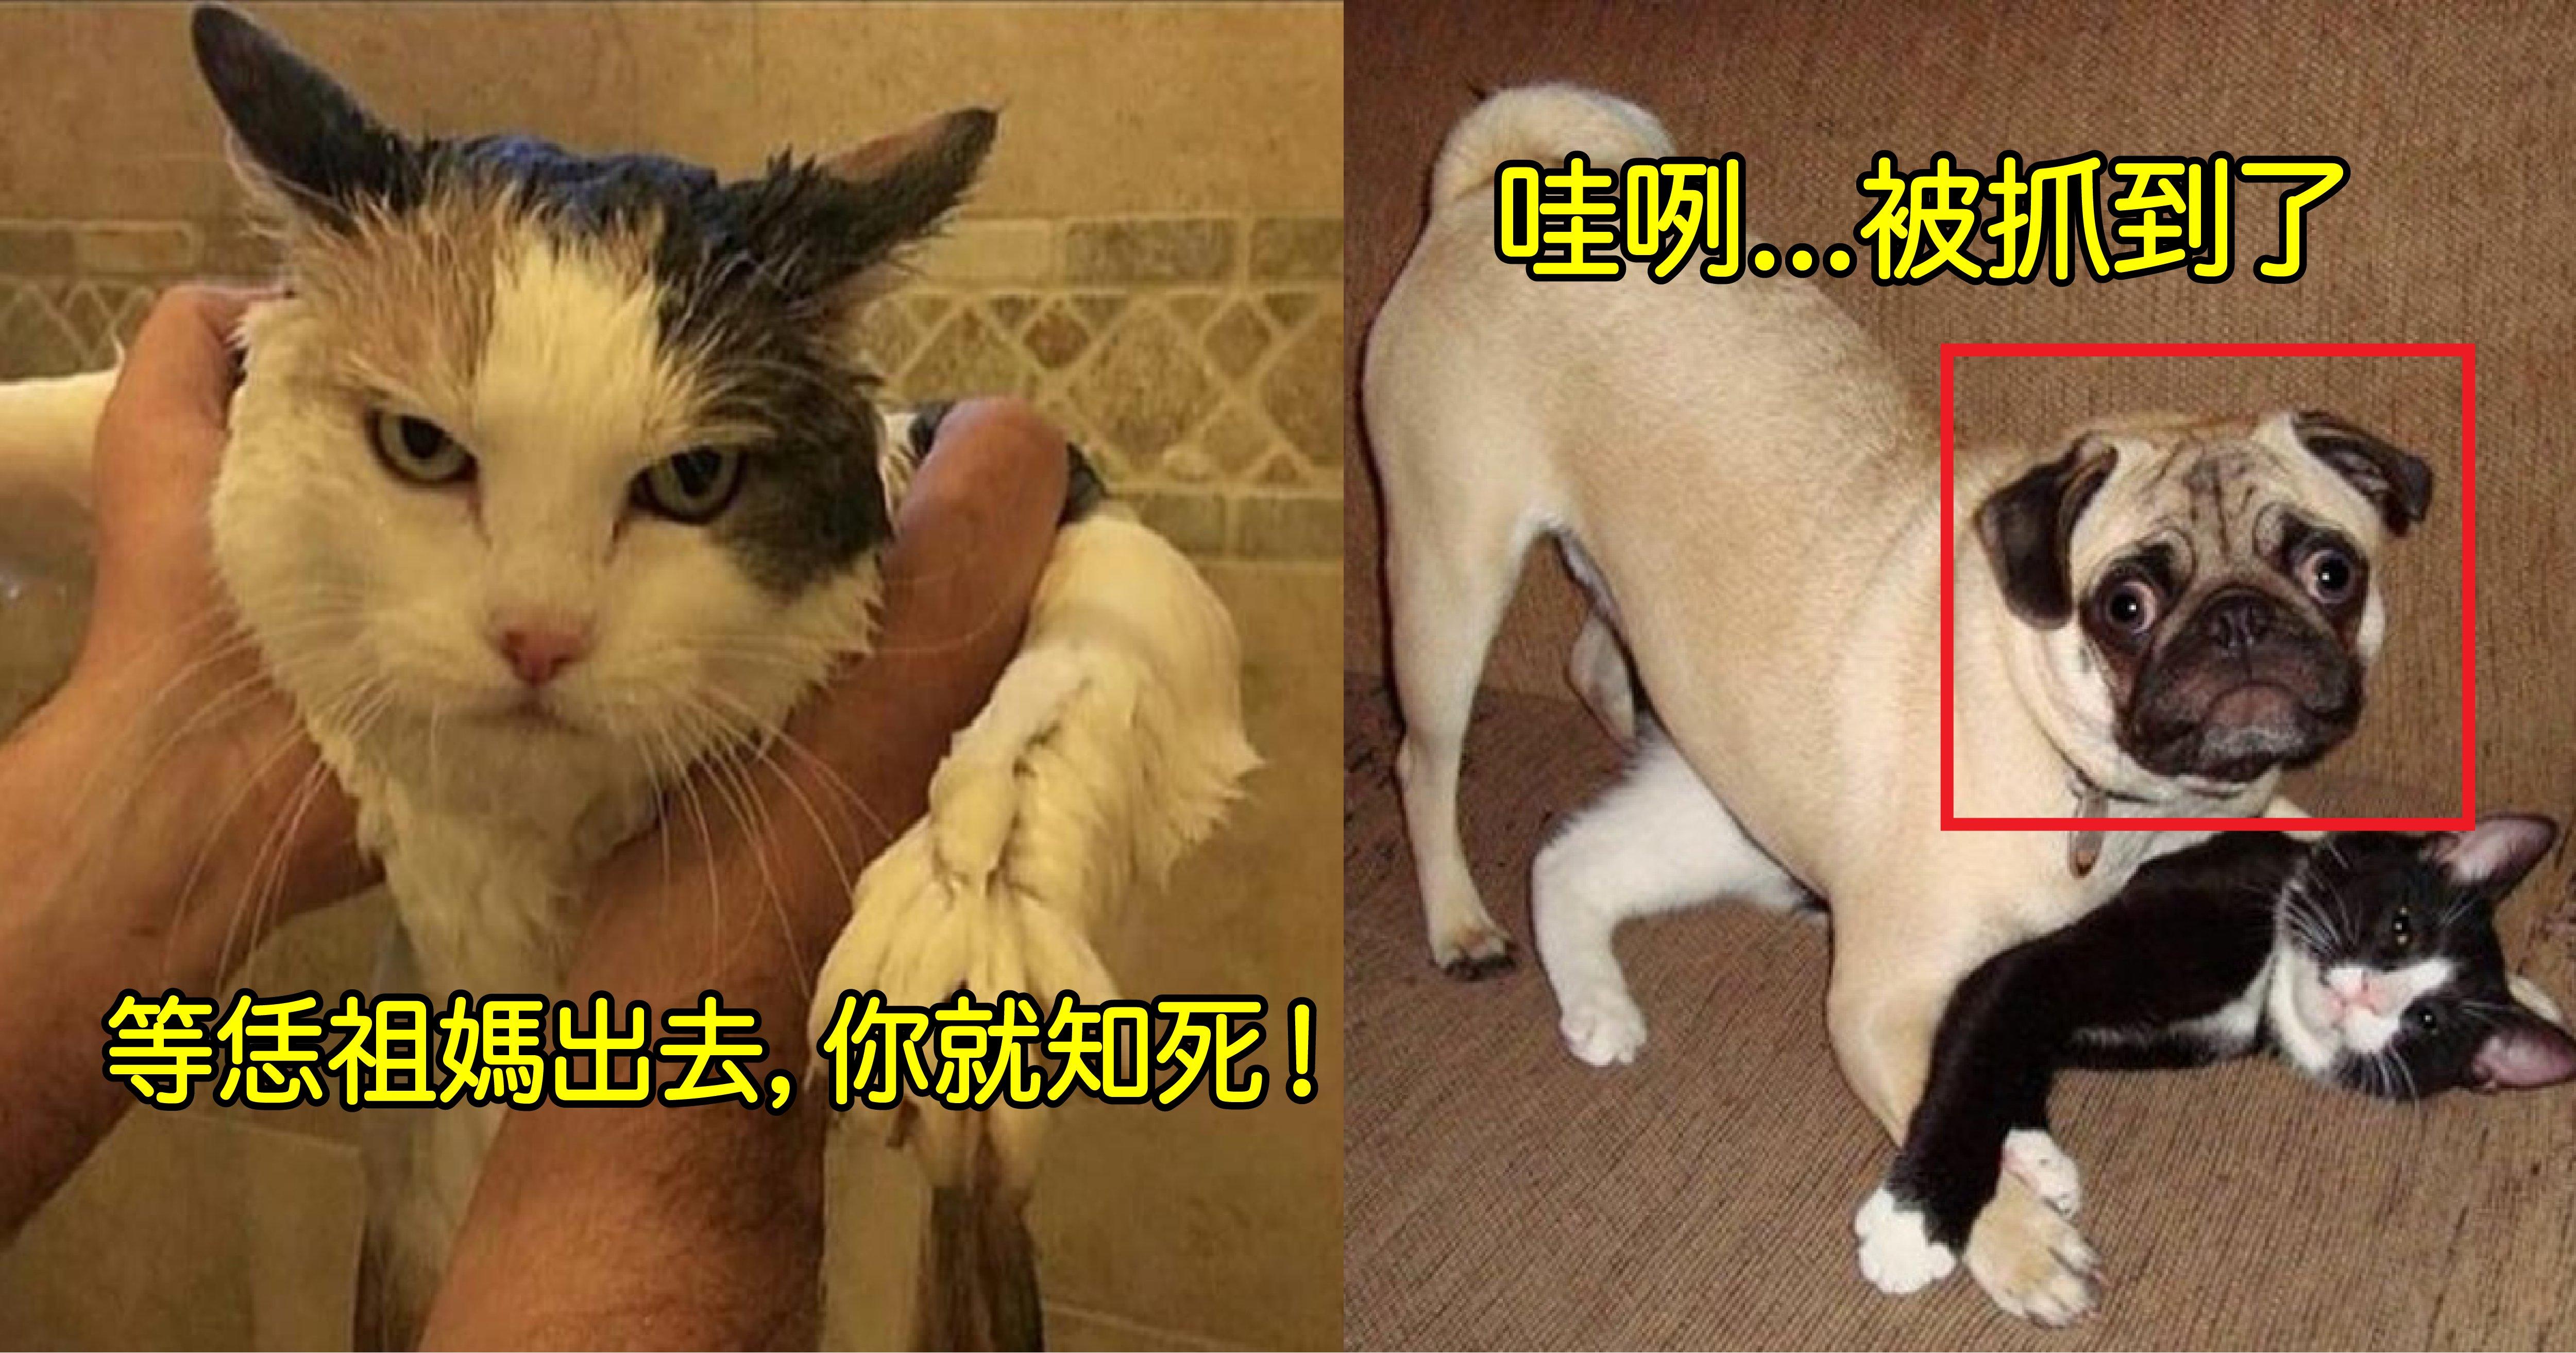 0916 3.png?resize=300,169 - 十張超爆笑寵物表情包!根本可以角逐寵物界的奧斯卡影帝